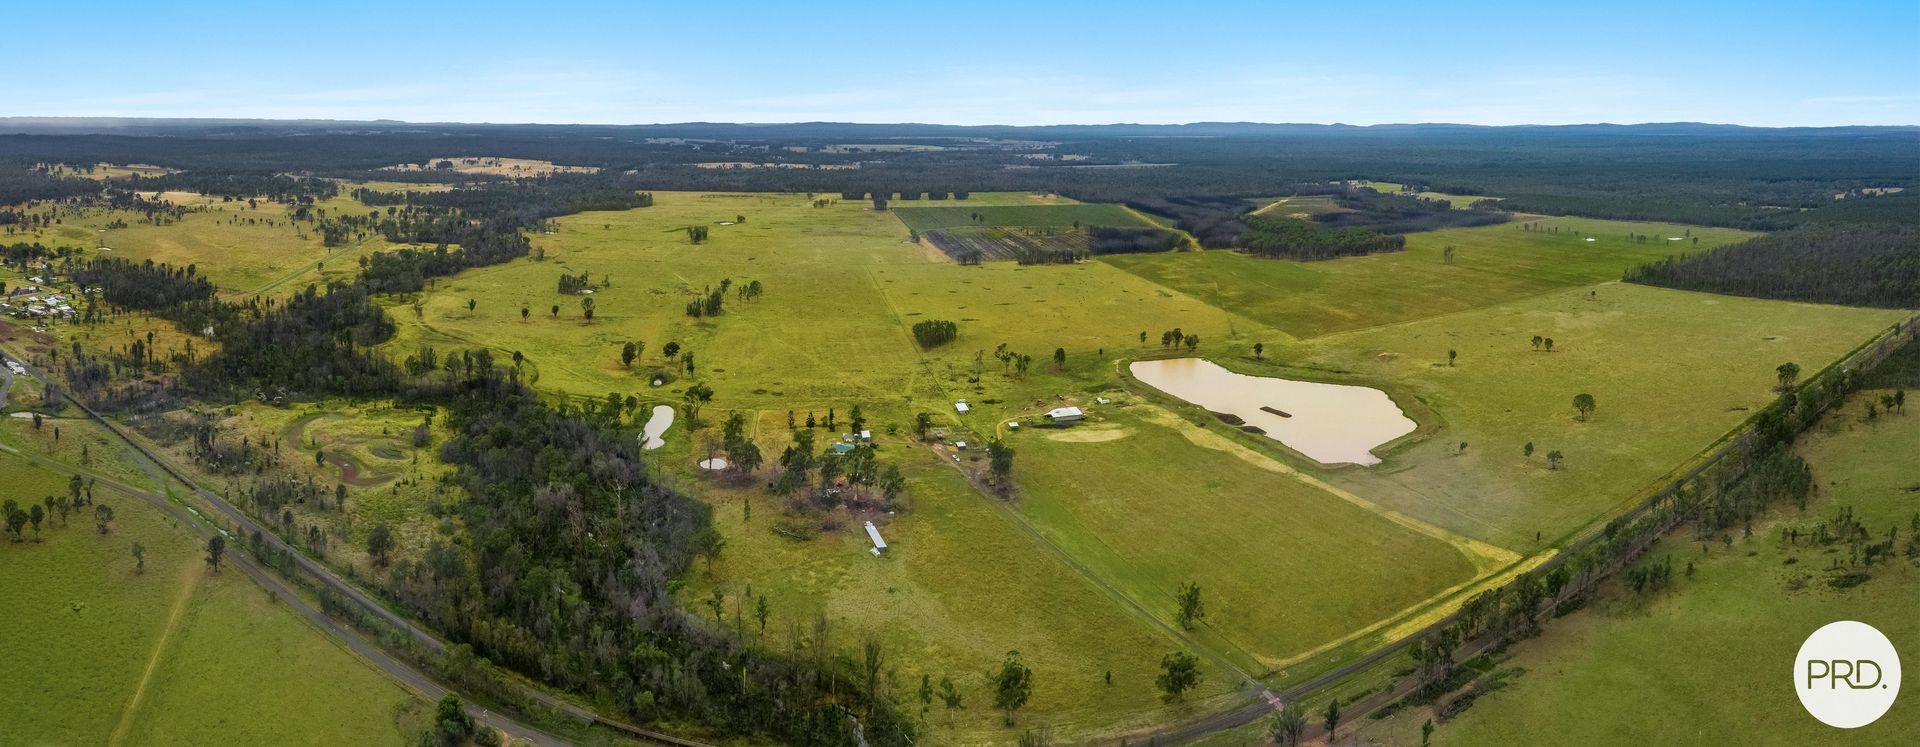 770-772 Myrtle Creek Road, Rappville NSW 2469, Image 0